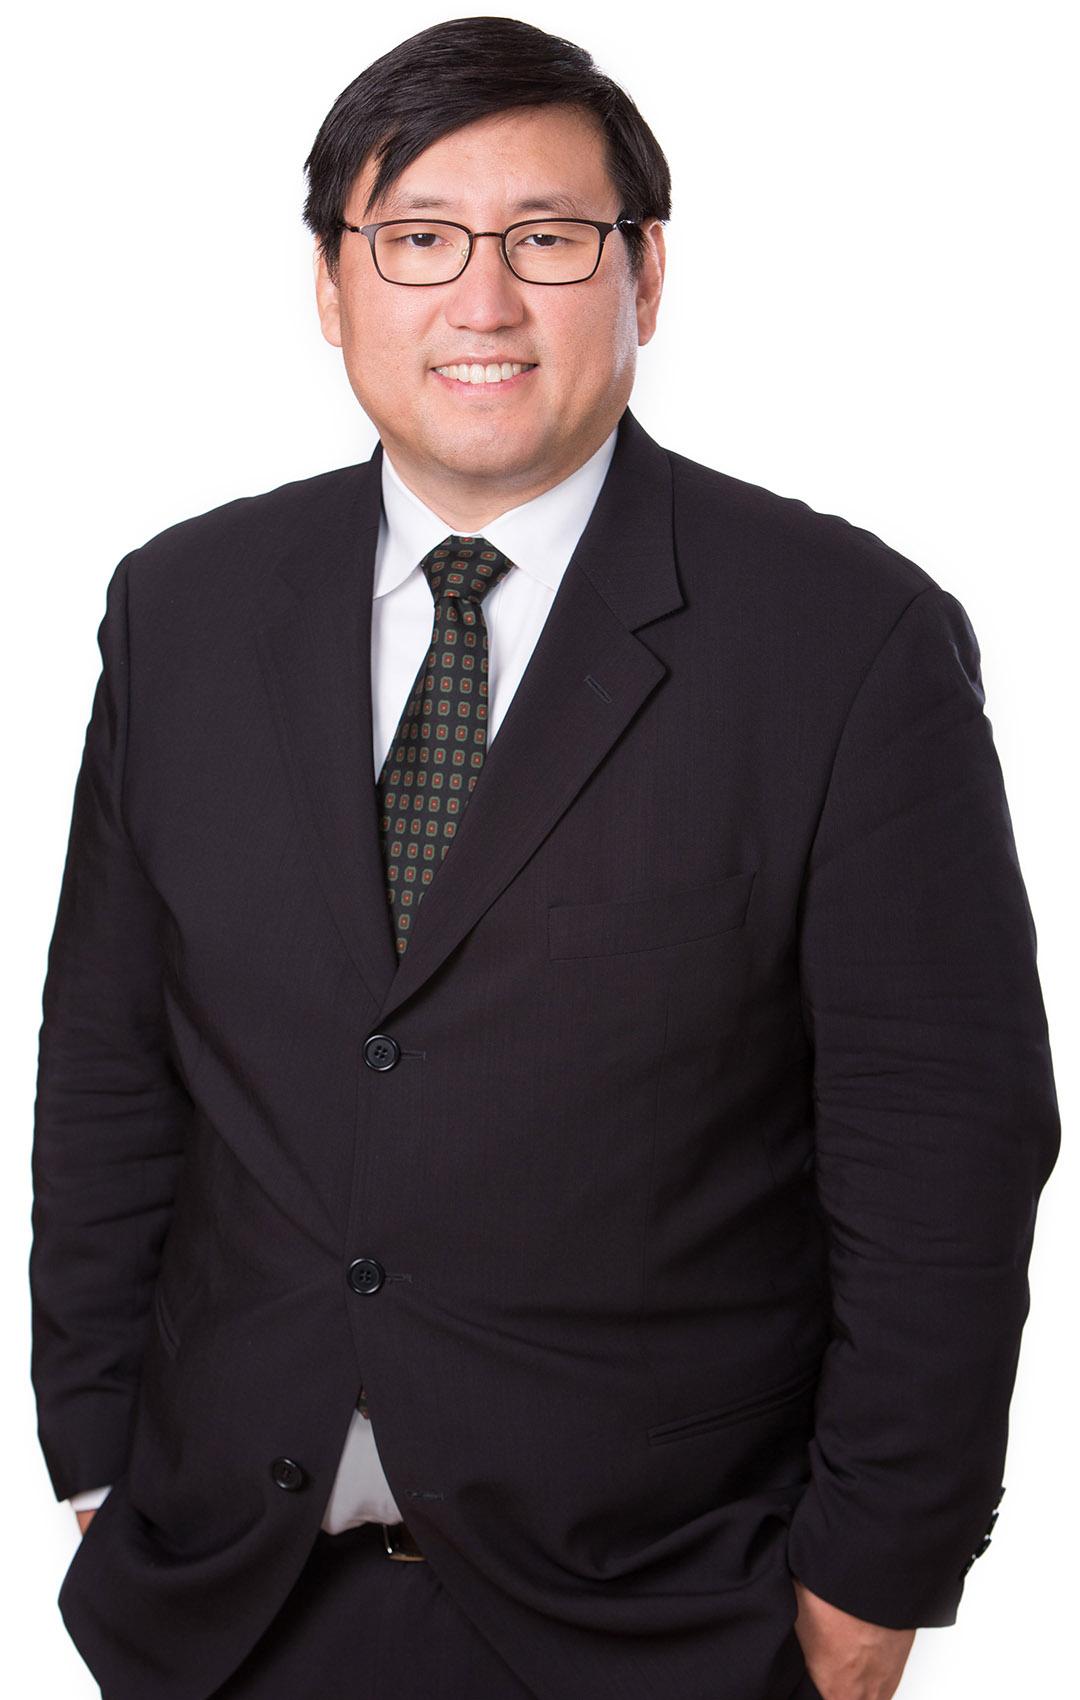 K. Thomas Ko